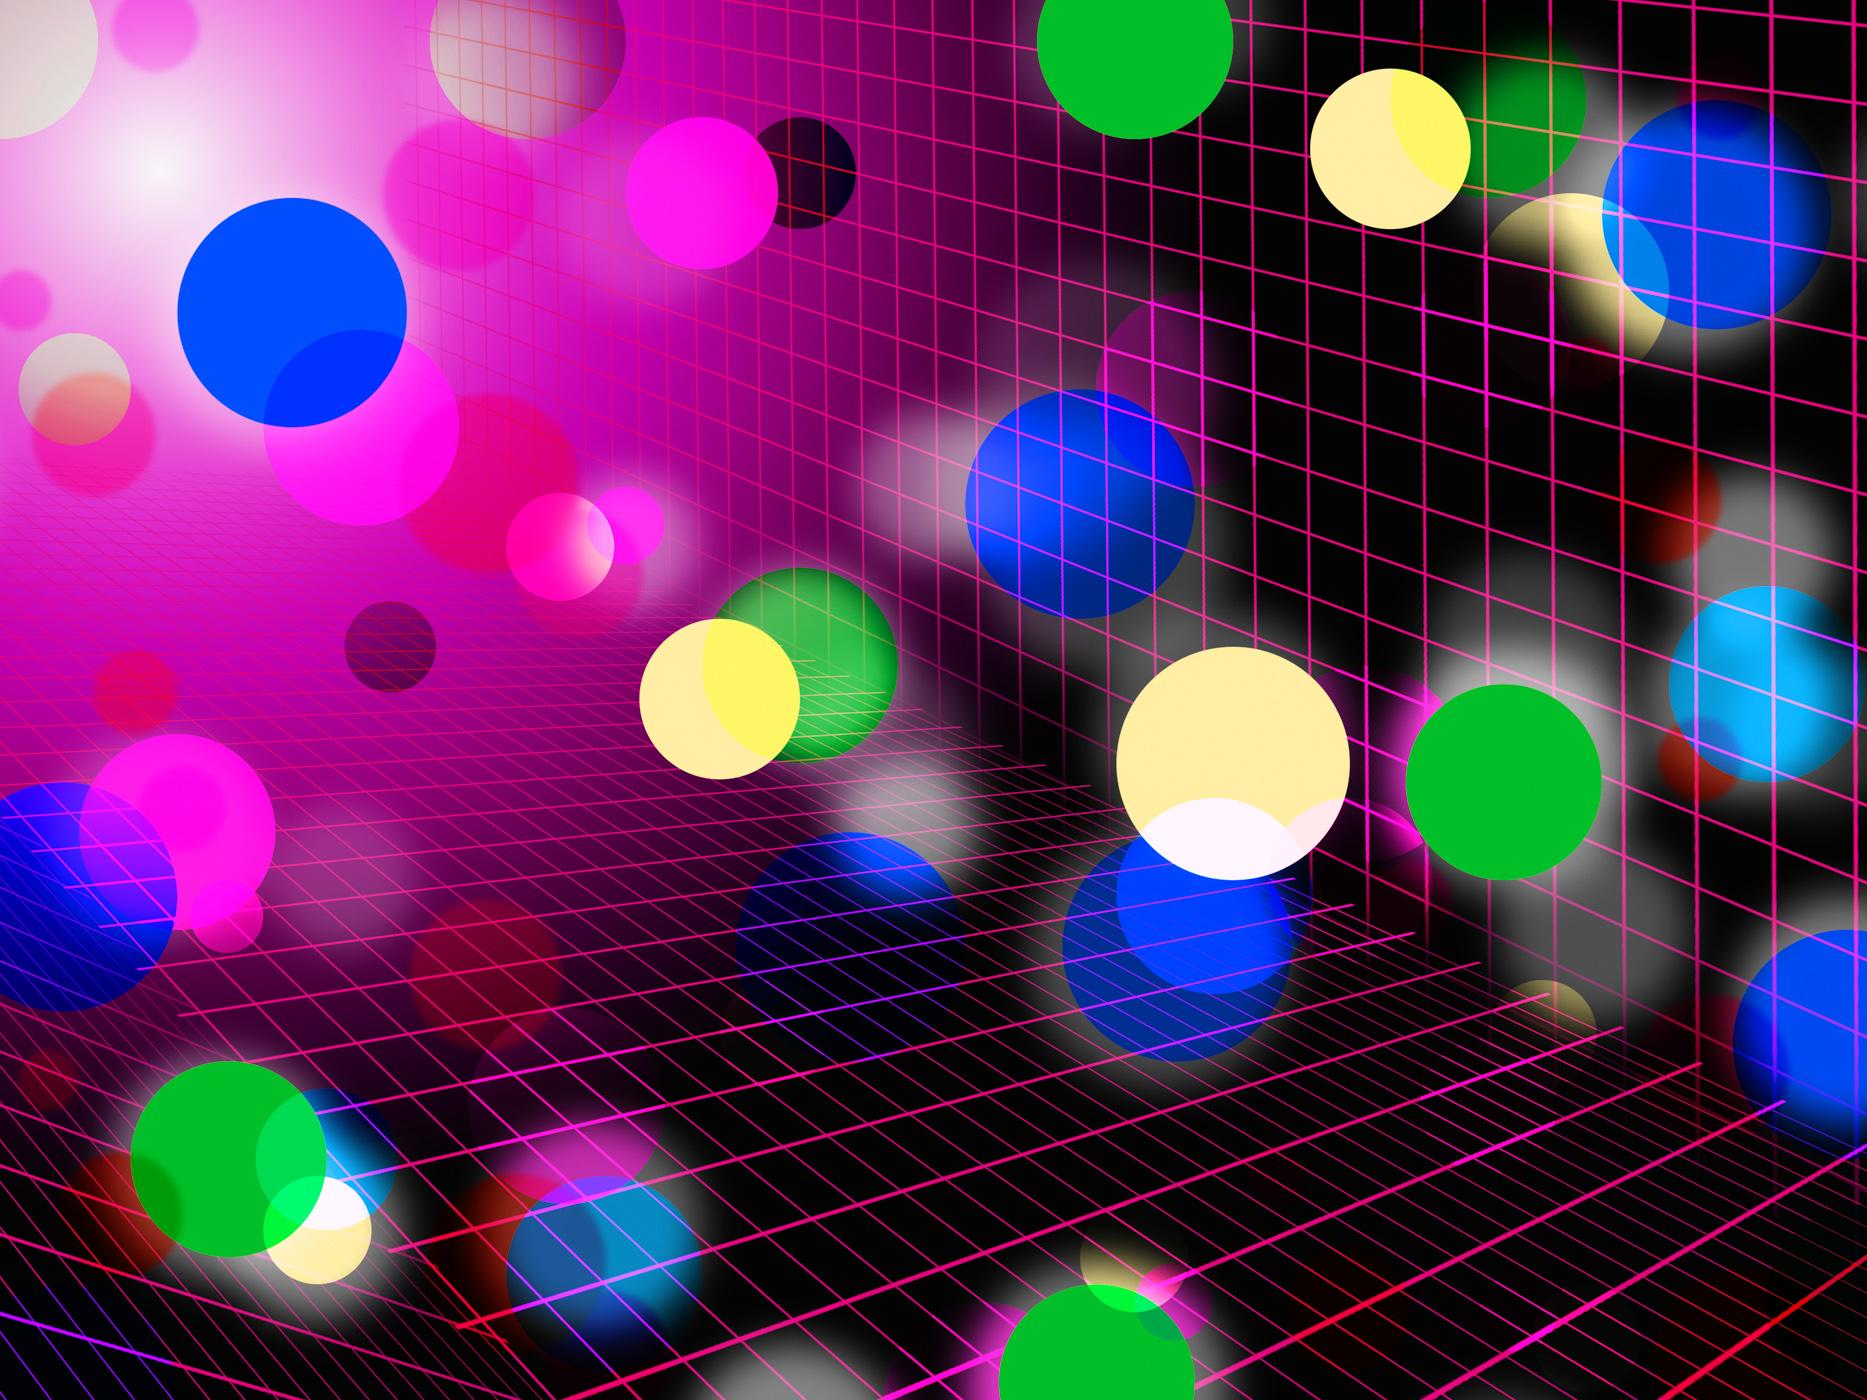 Pink Bubbles Background Shows Circles Grid And Shining, Brightness, Brilliant, Bubbles, Circles, HQ Photo